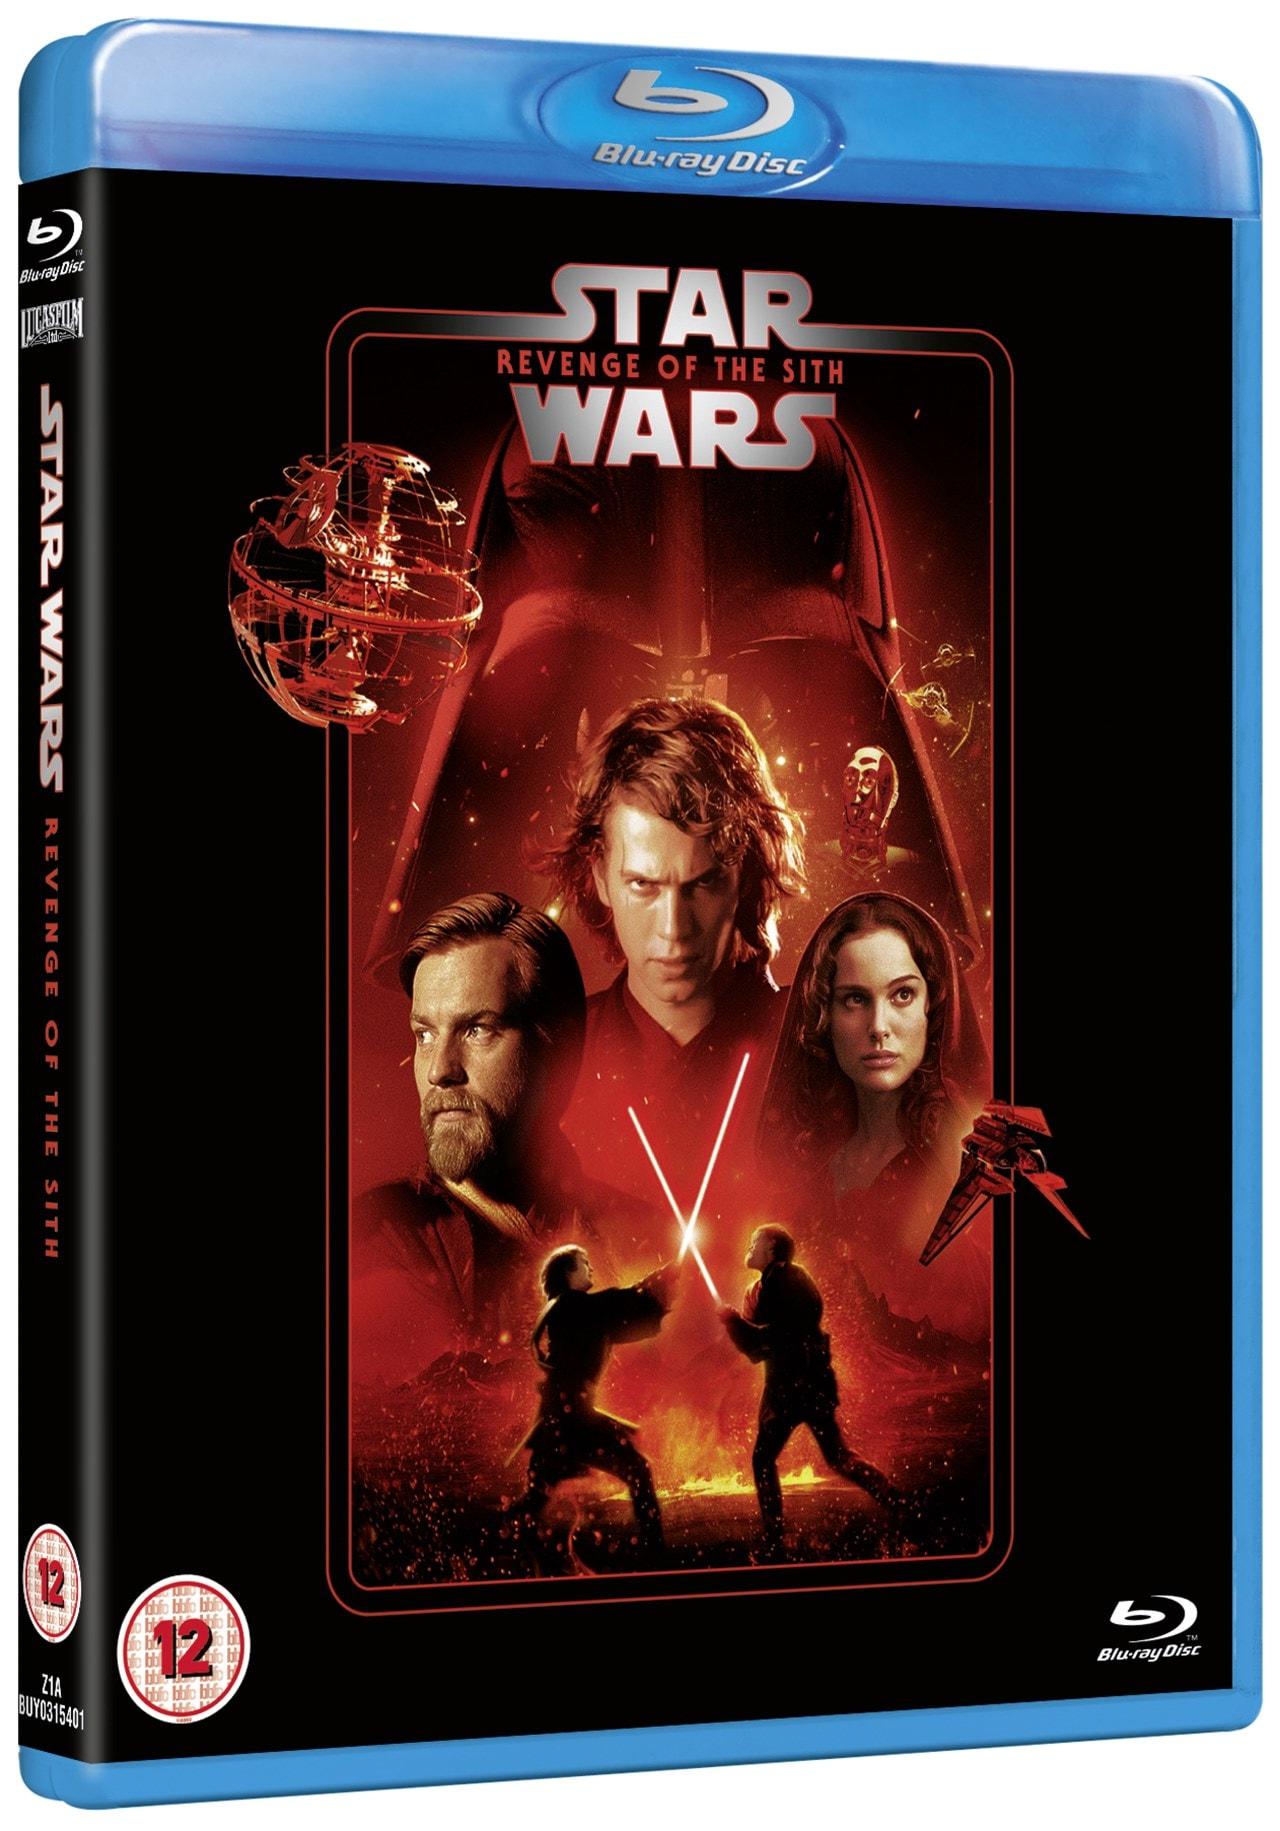 Star Wars: Episode III - Revenge of the Sith - 2